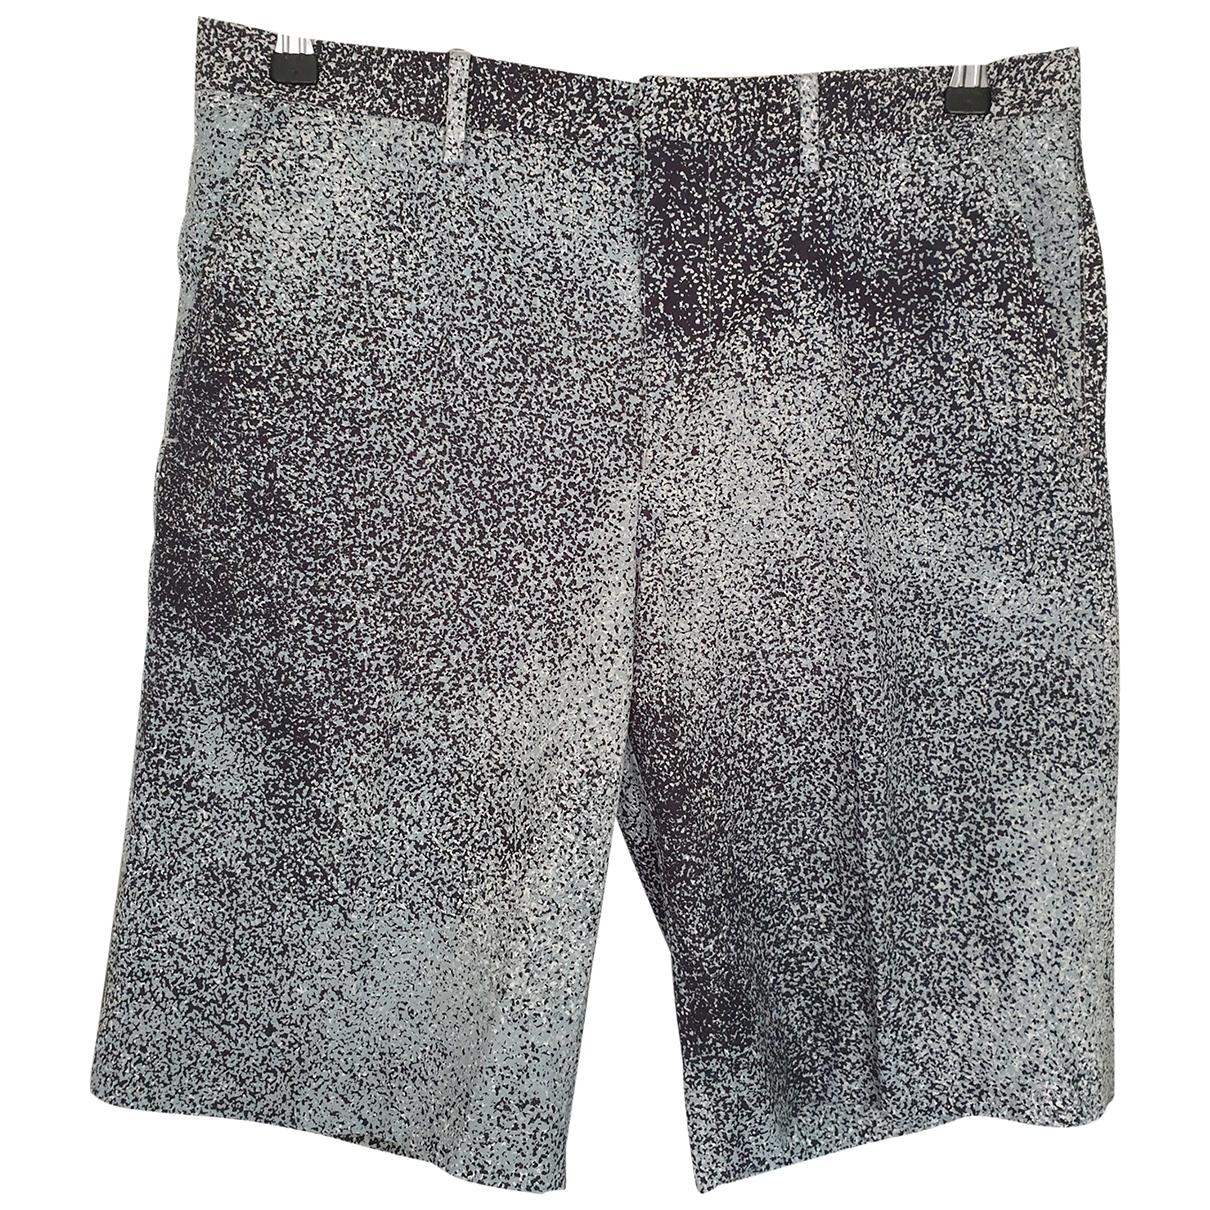 Kenzo \N Shorts in  Anthrazit Baumwolle